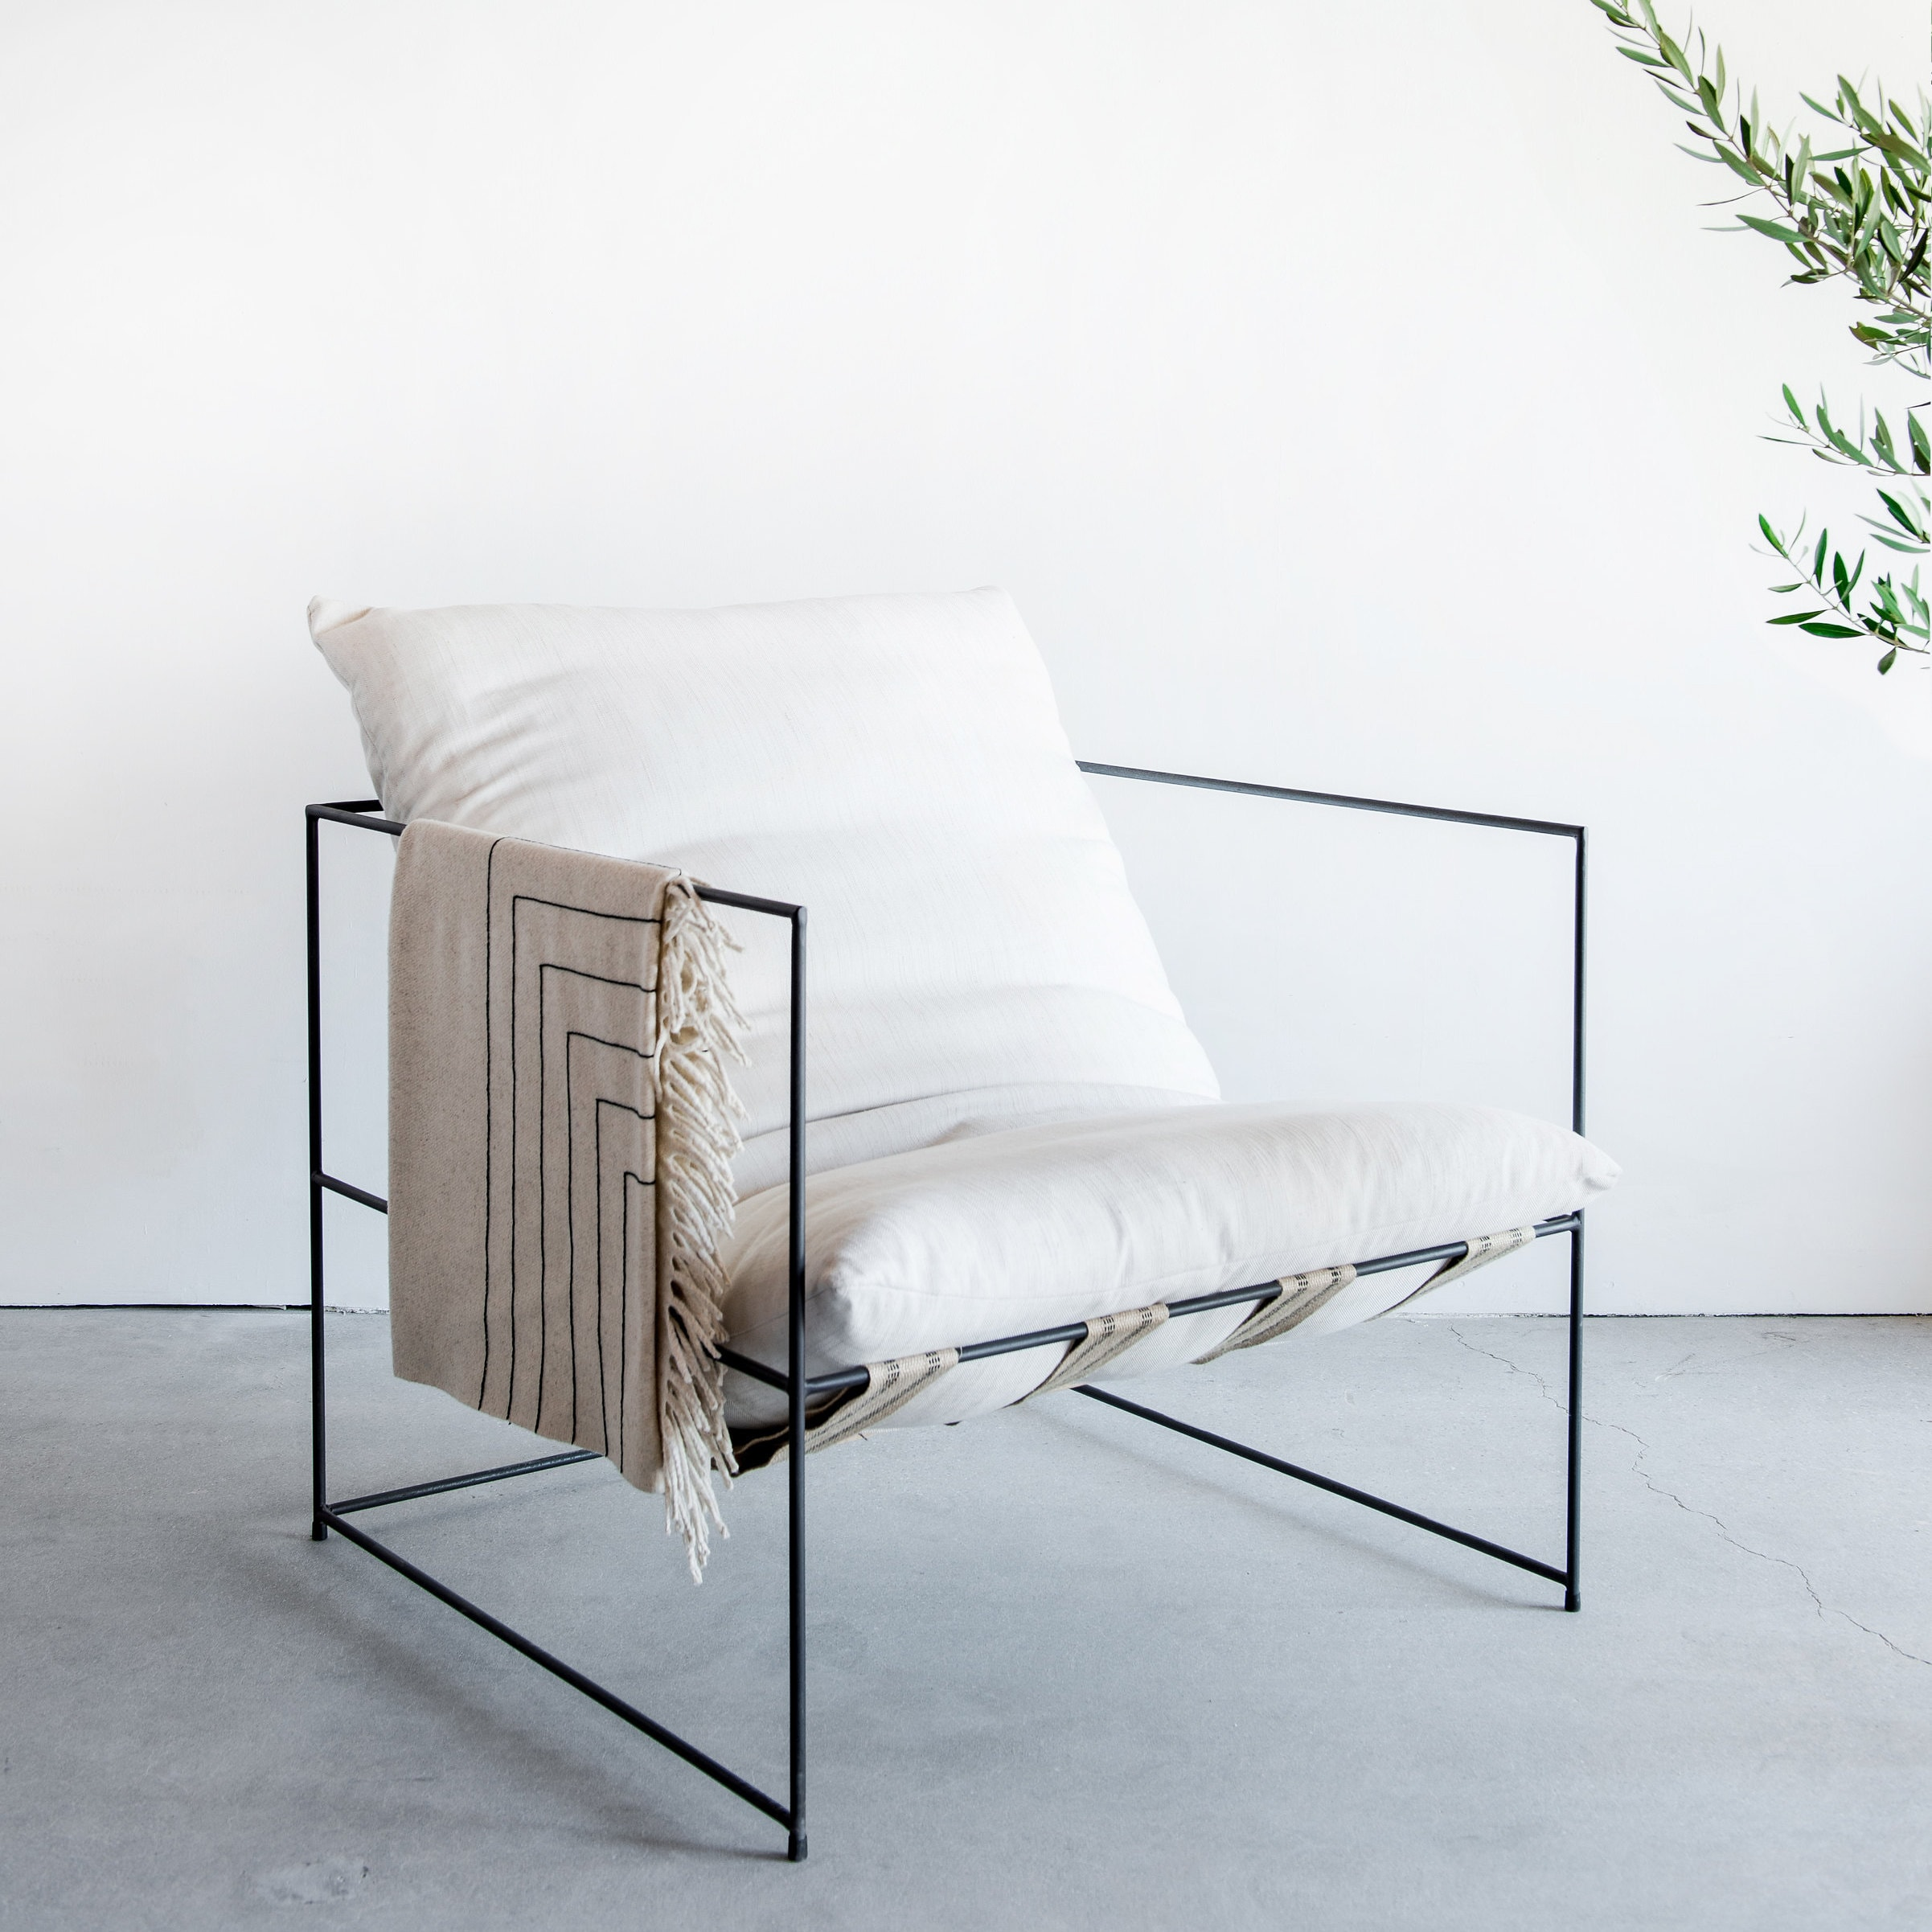 Croft House California Modern Furniture por CroftHouseLA en Etsy